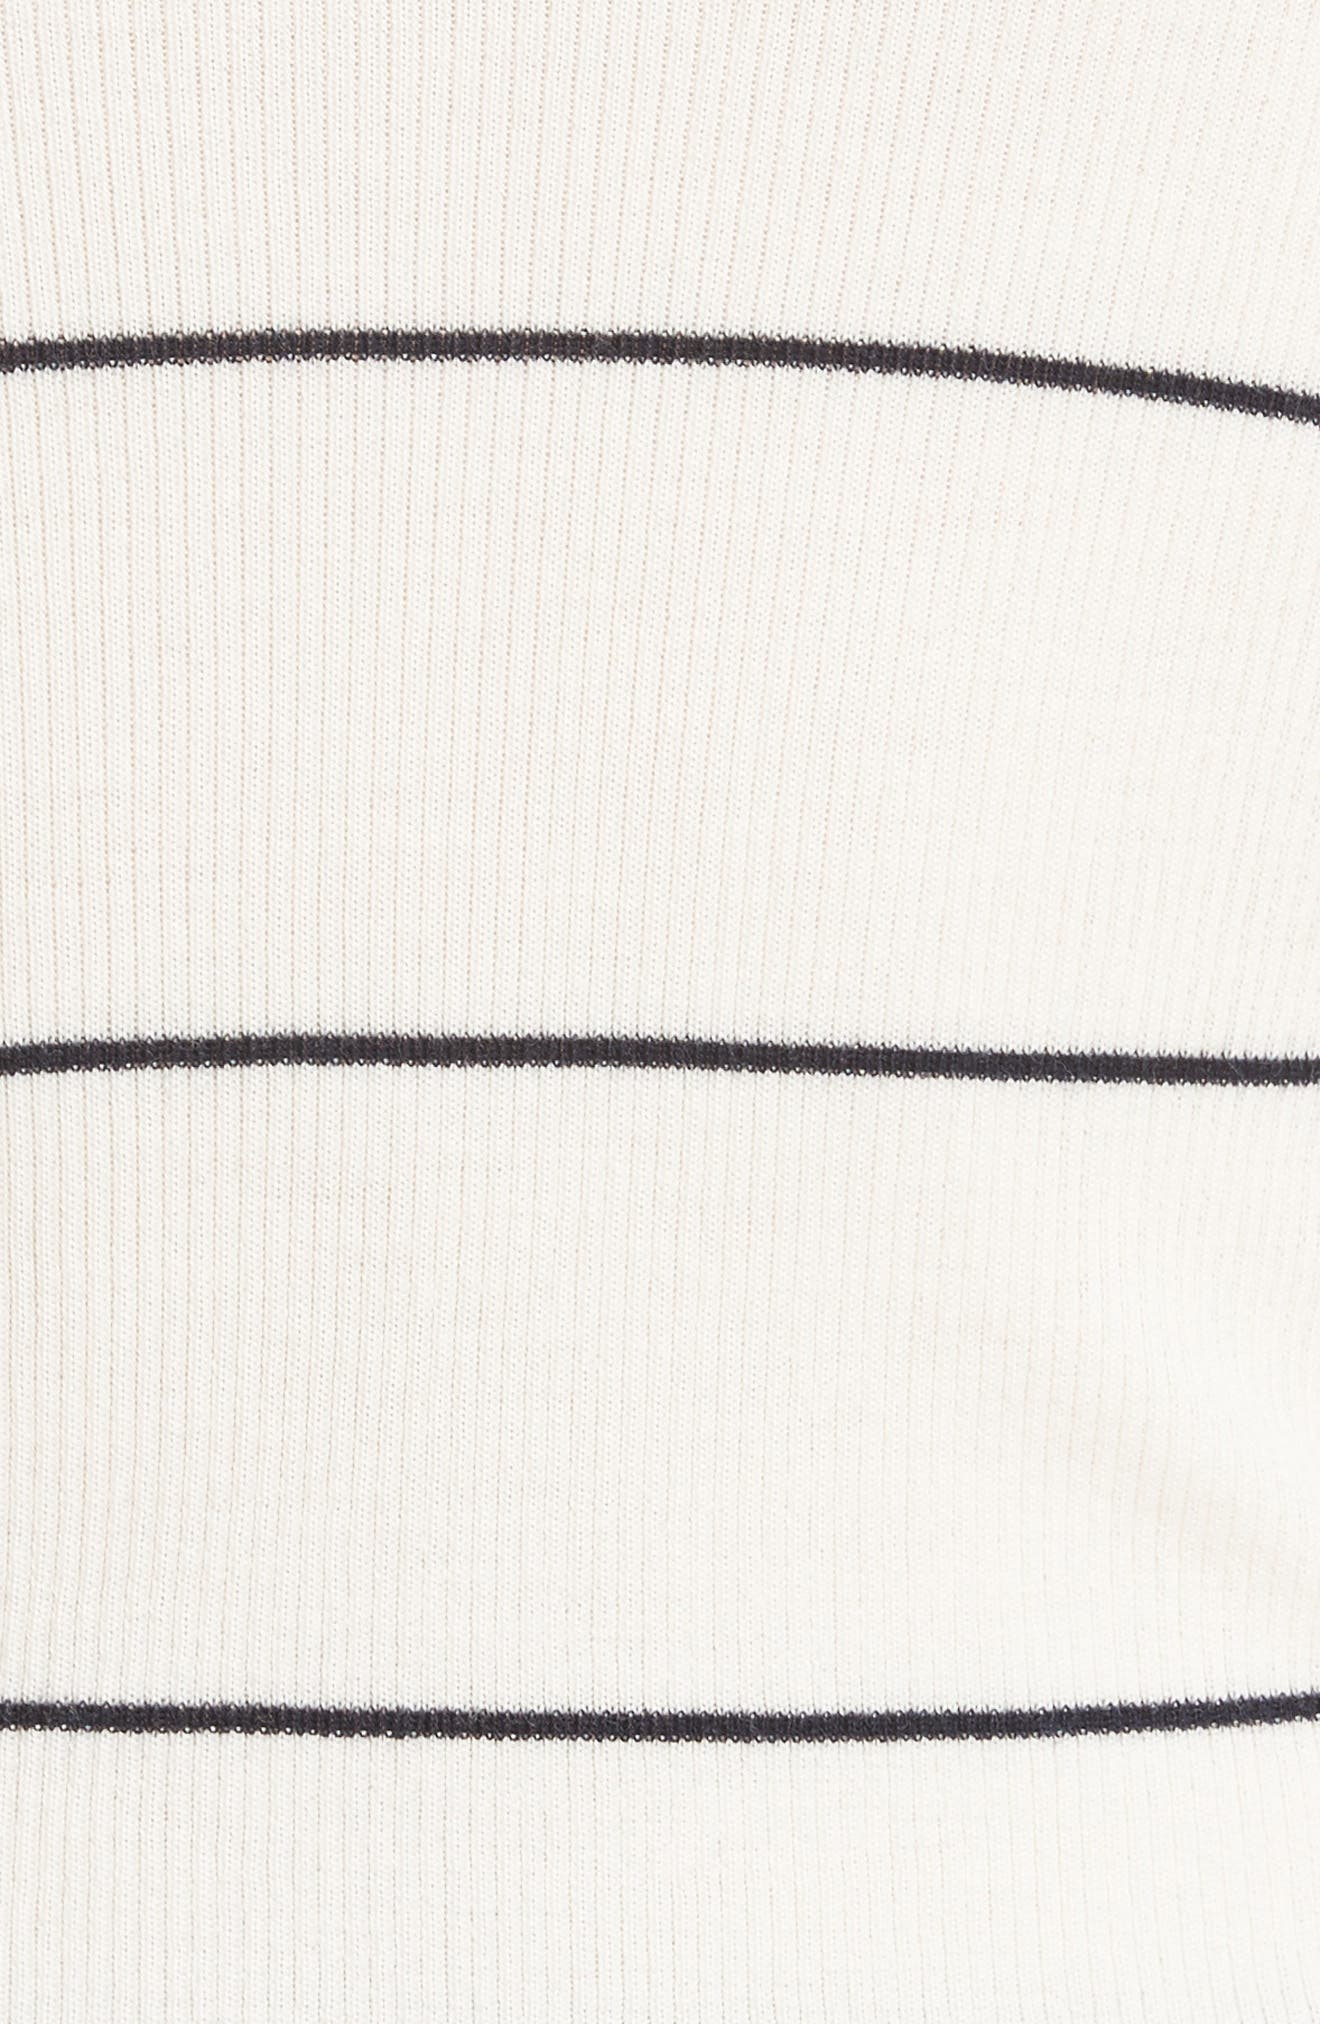 Stripe Crop Turtleneck,                             Alternate thumbnail 5, color,                             Ivory/ Deep Navy